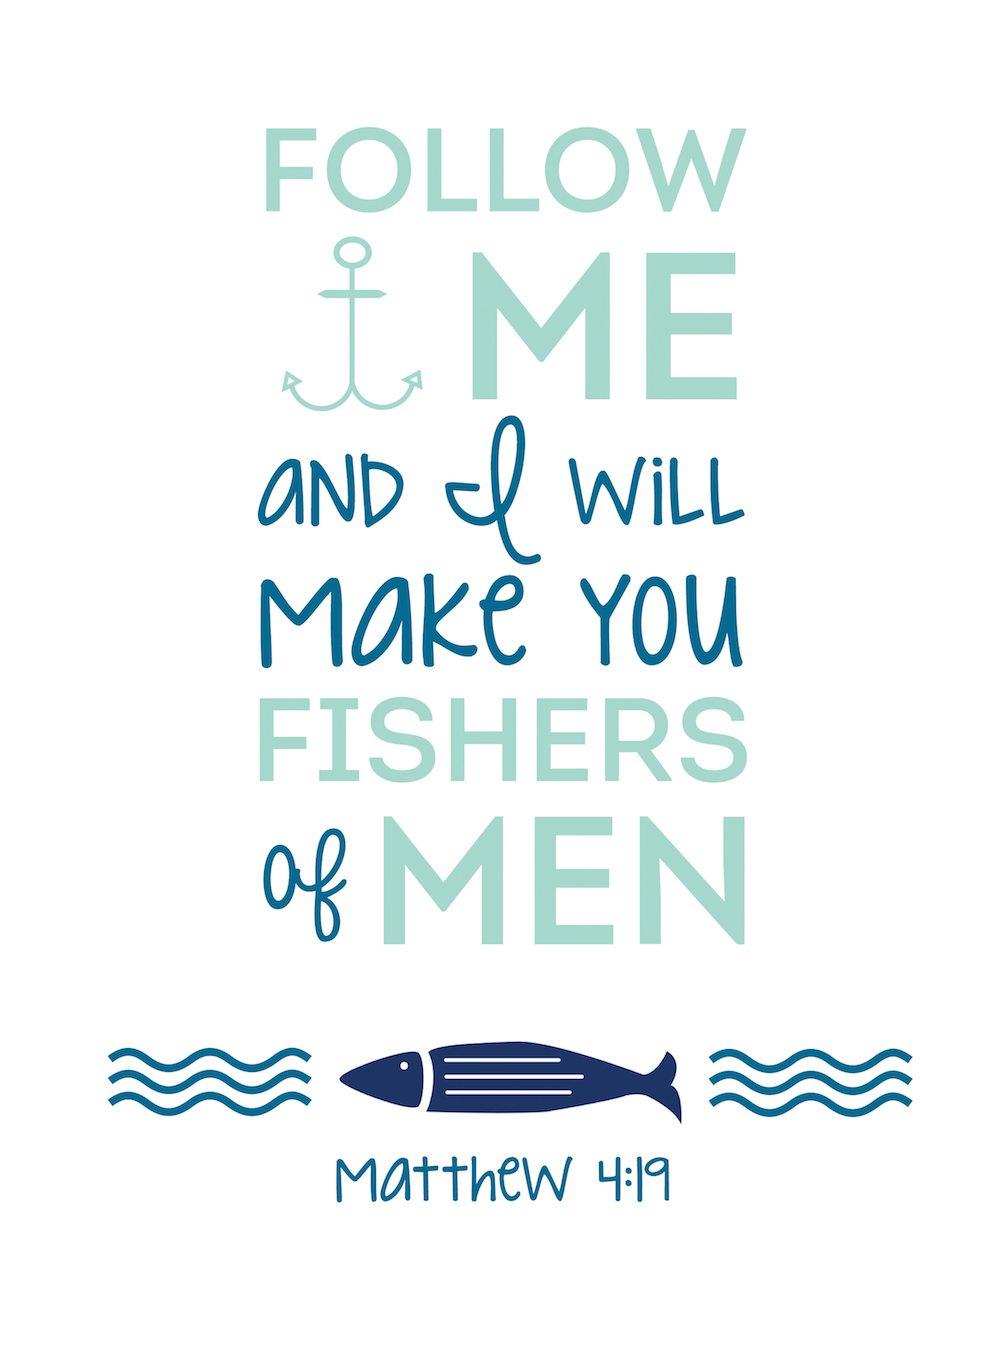 Free Bible Printable – Matthew 4:19